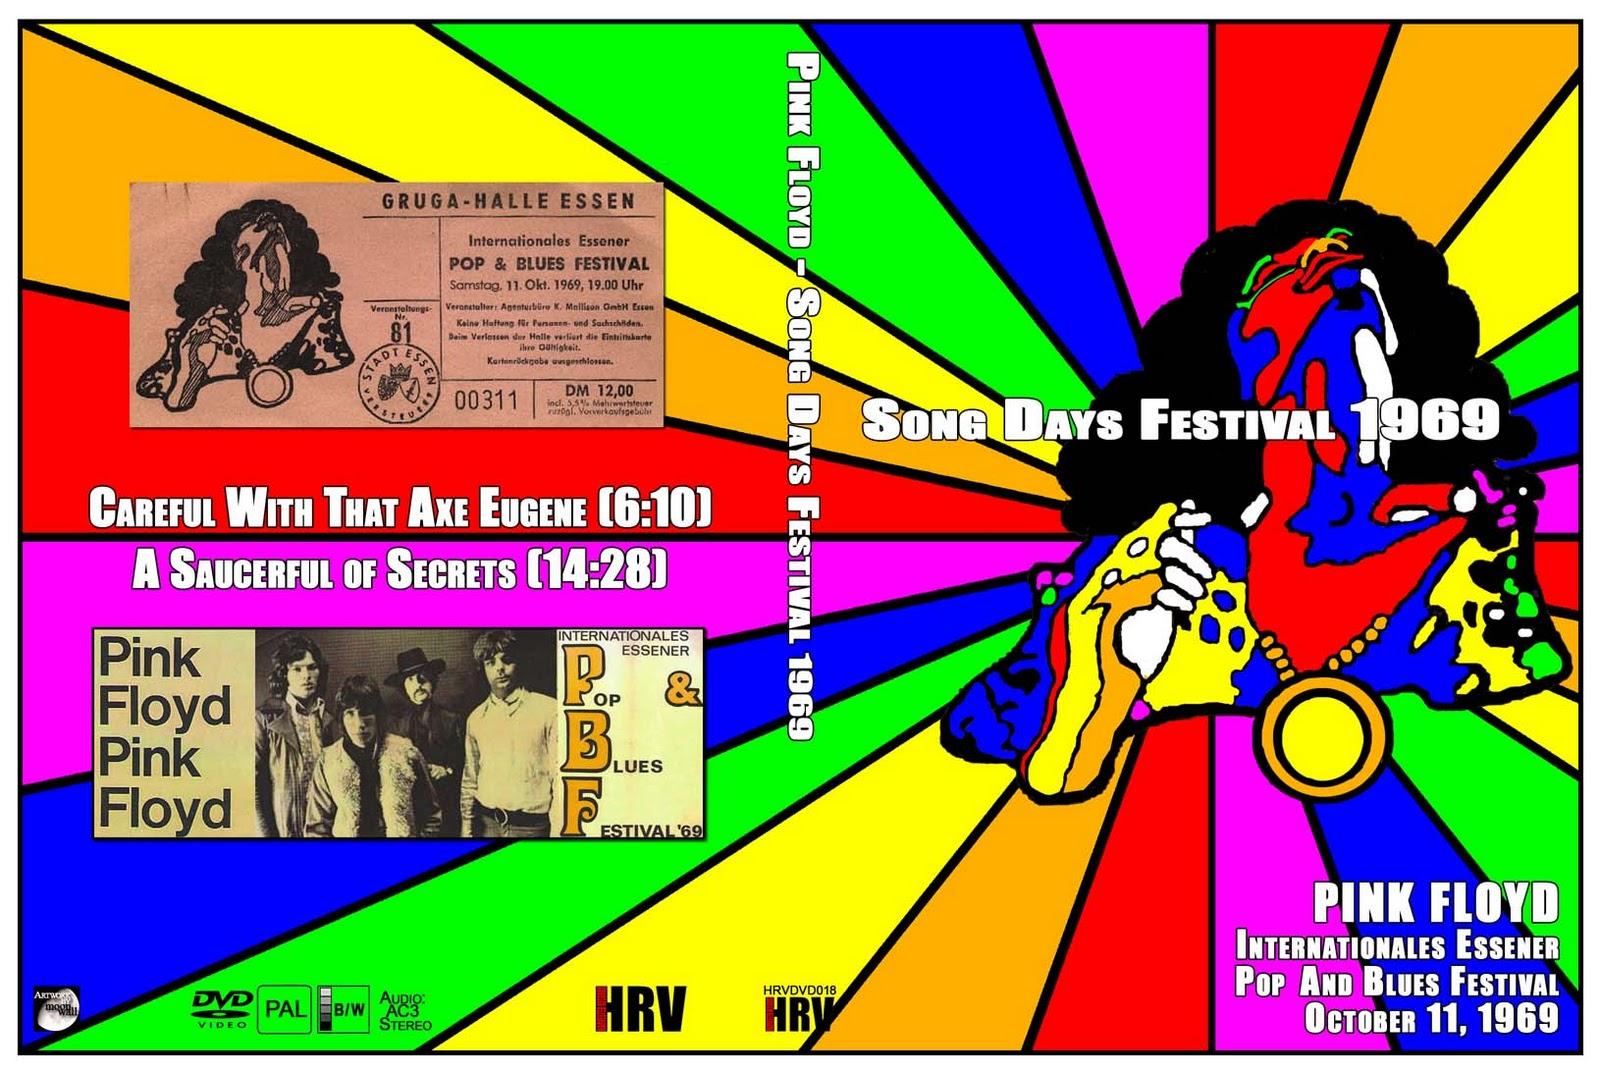 http://2.bp.blogspot.com/-AVY88P4AQDk/TZk8kZjjZVI/AAAAAAAACbM/bhgMjMW6iDA/s1600/DVD+Cover+-+Pink+Floyd+-+10-11-1969+-+Pop+And+Blues+Festival.jpg